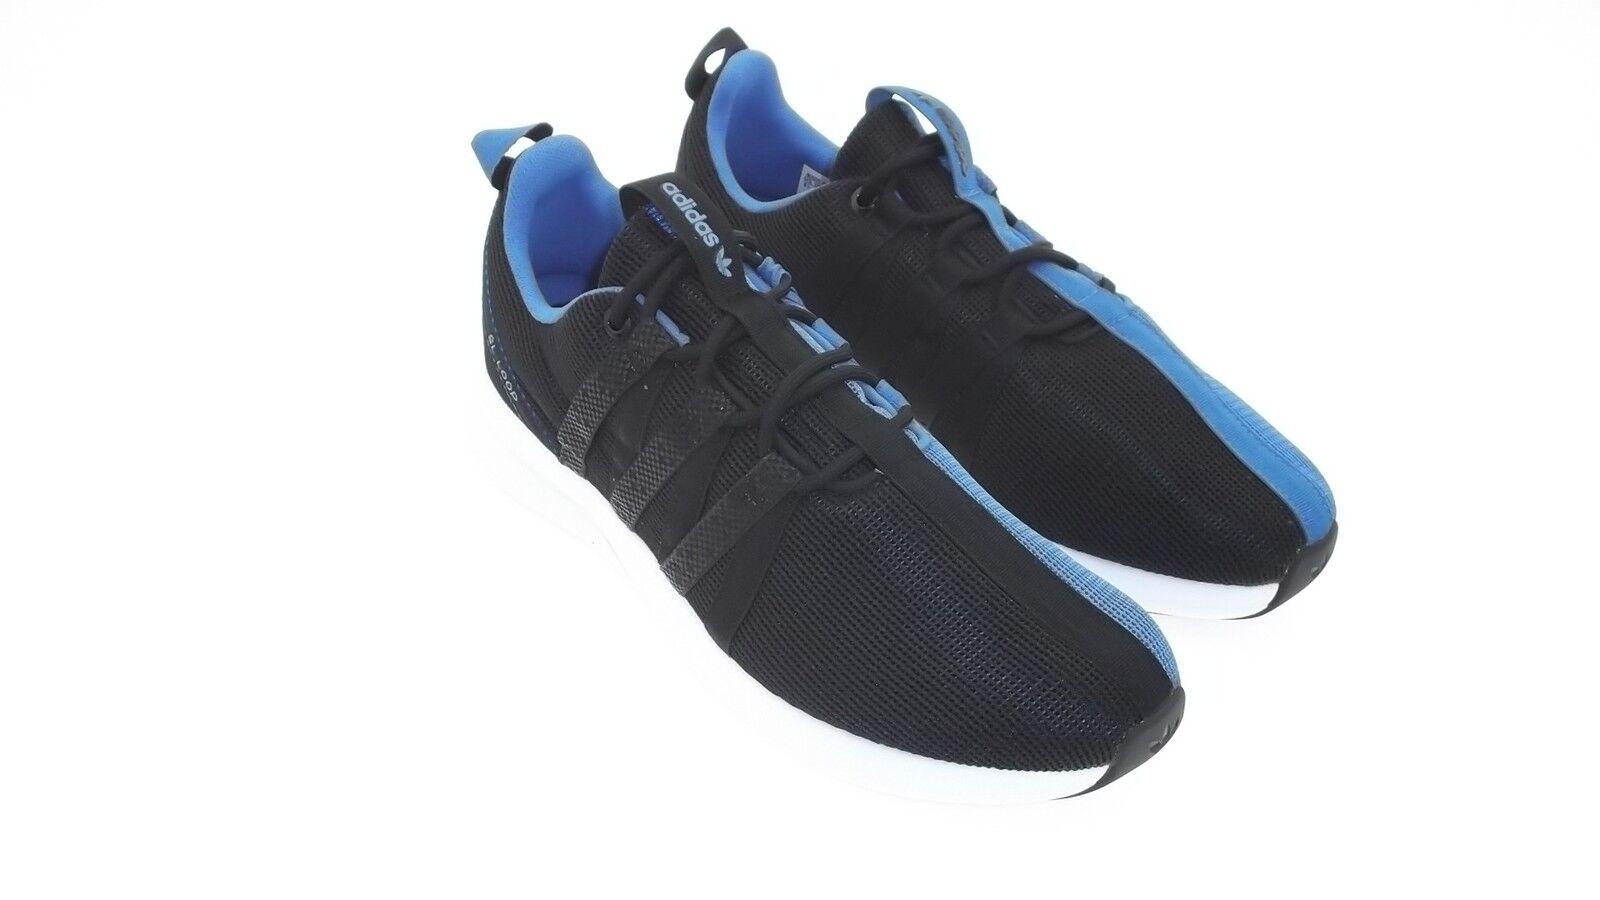 adidas männer c77007 - rennen blubir cblack c77007 männer blau! 17de9b